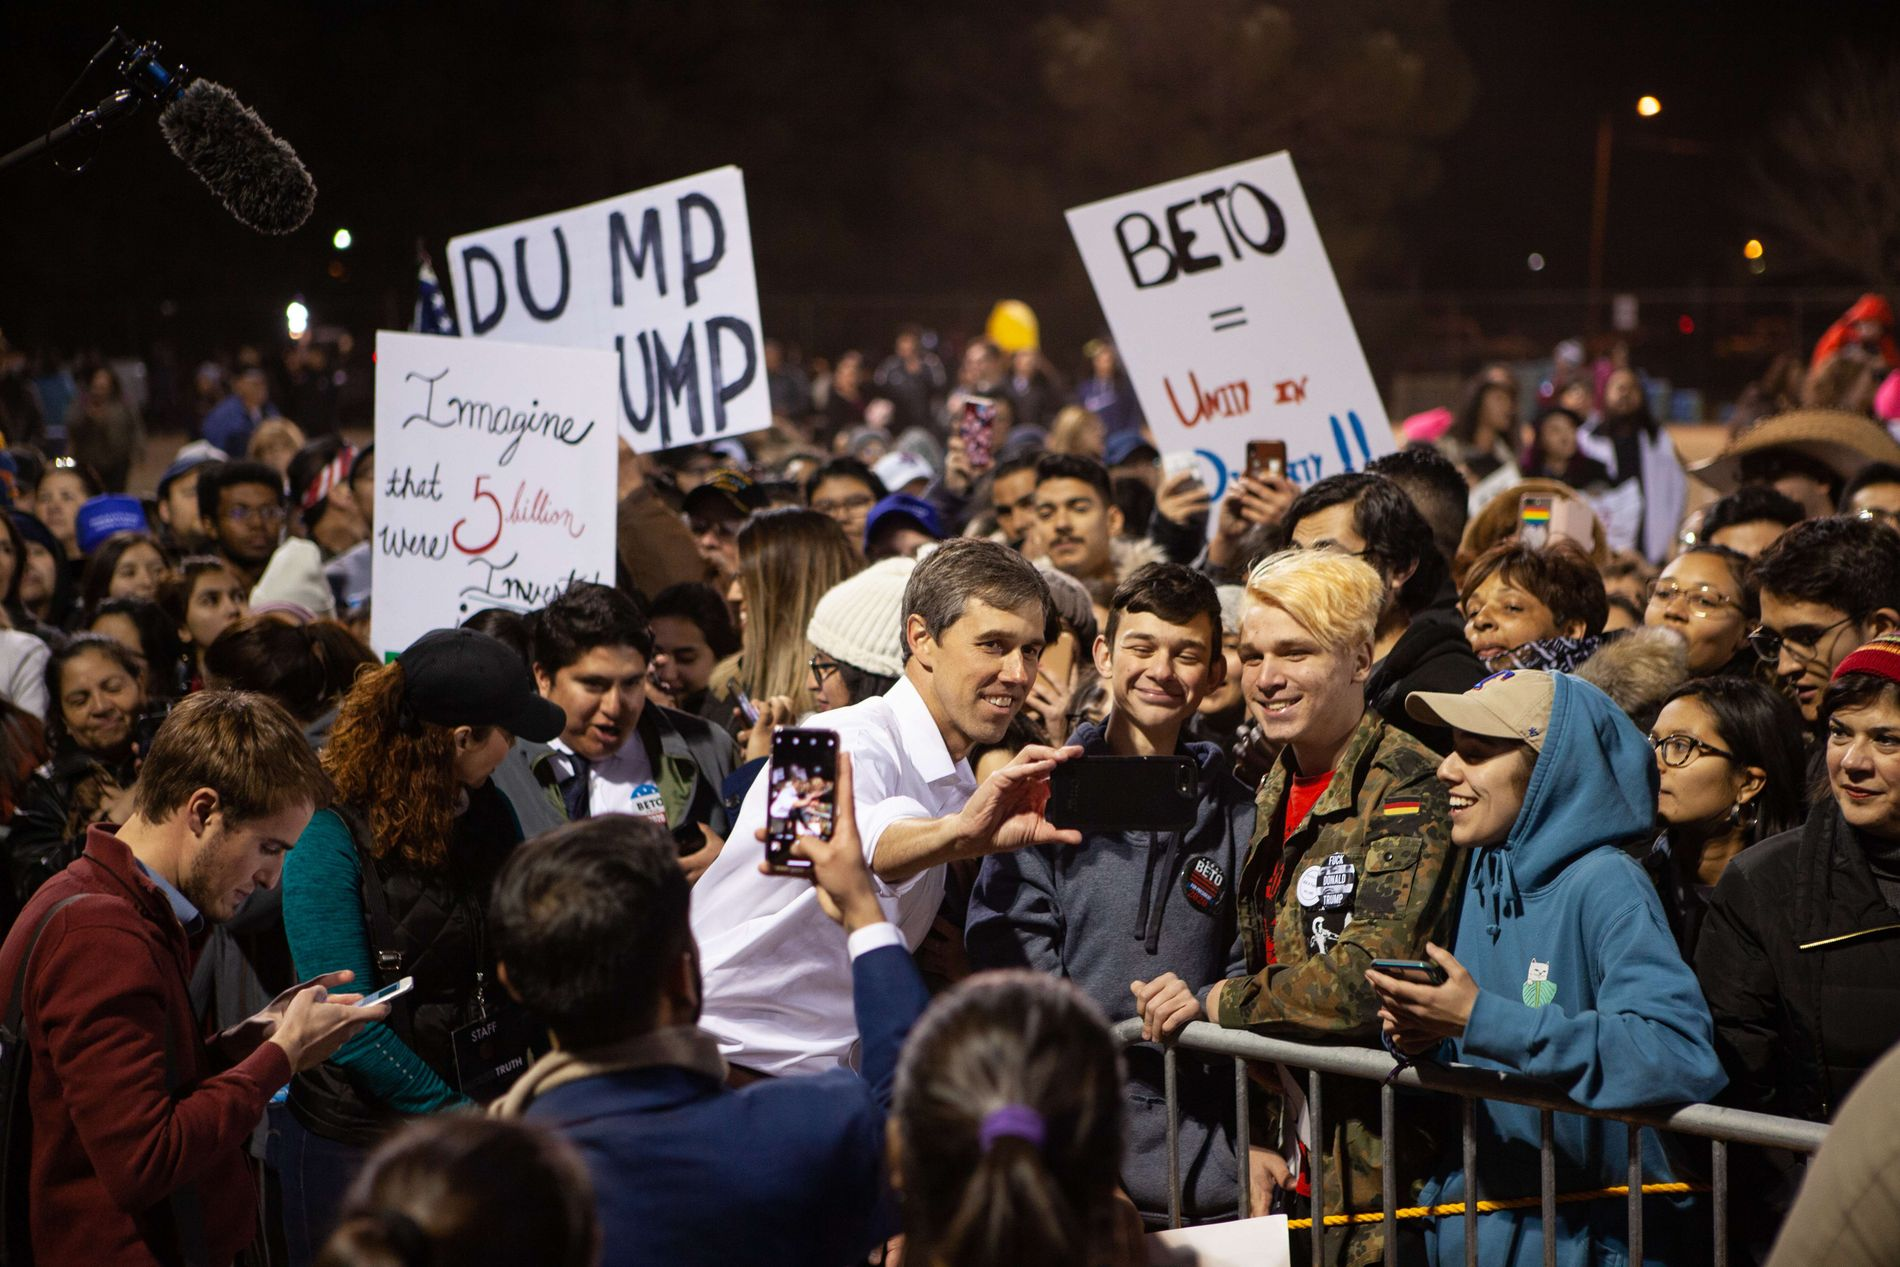 POPULÆR: Beto O'Rourke tar selfier med fans under et arrangement på grensen til Mexico i februar.